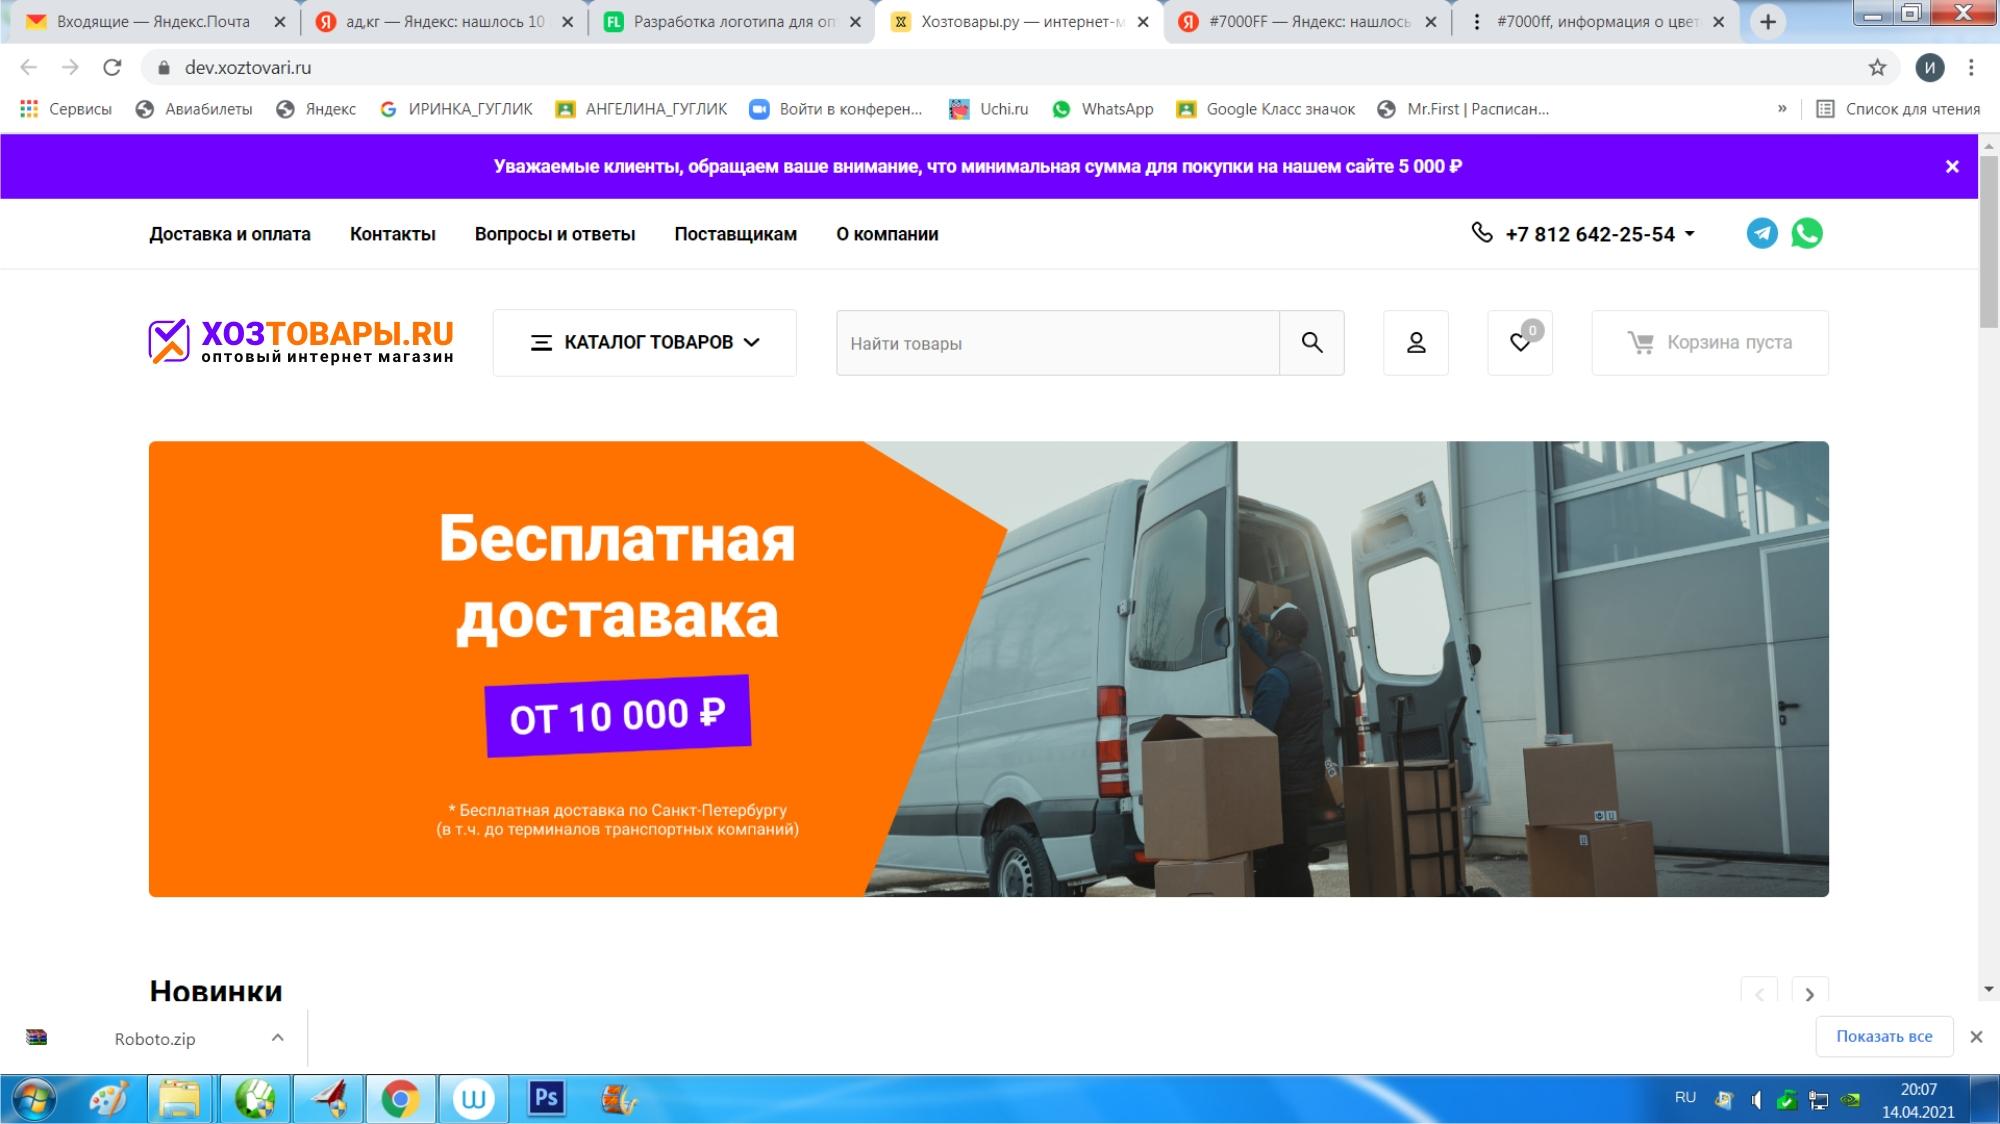 Разработка логотипа для оптового интернет-магазина «Хозтовары.ру» фото f_2816077064518e87.jpg